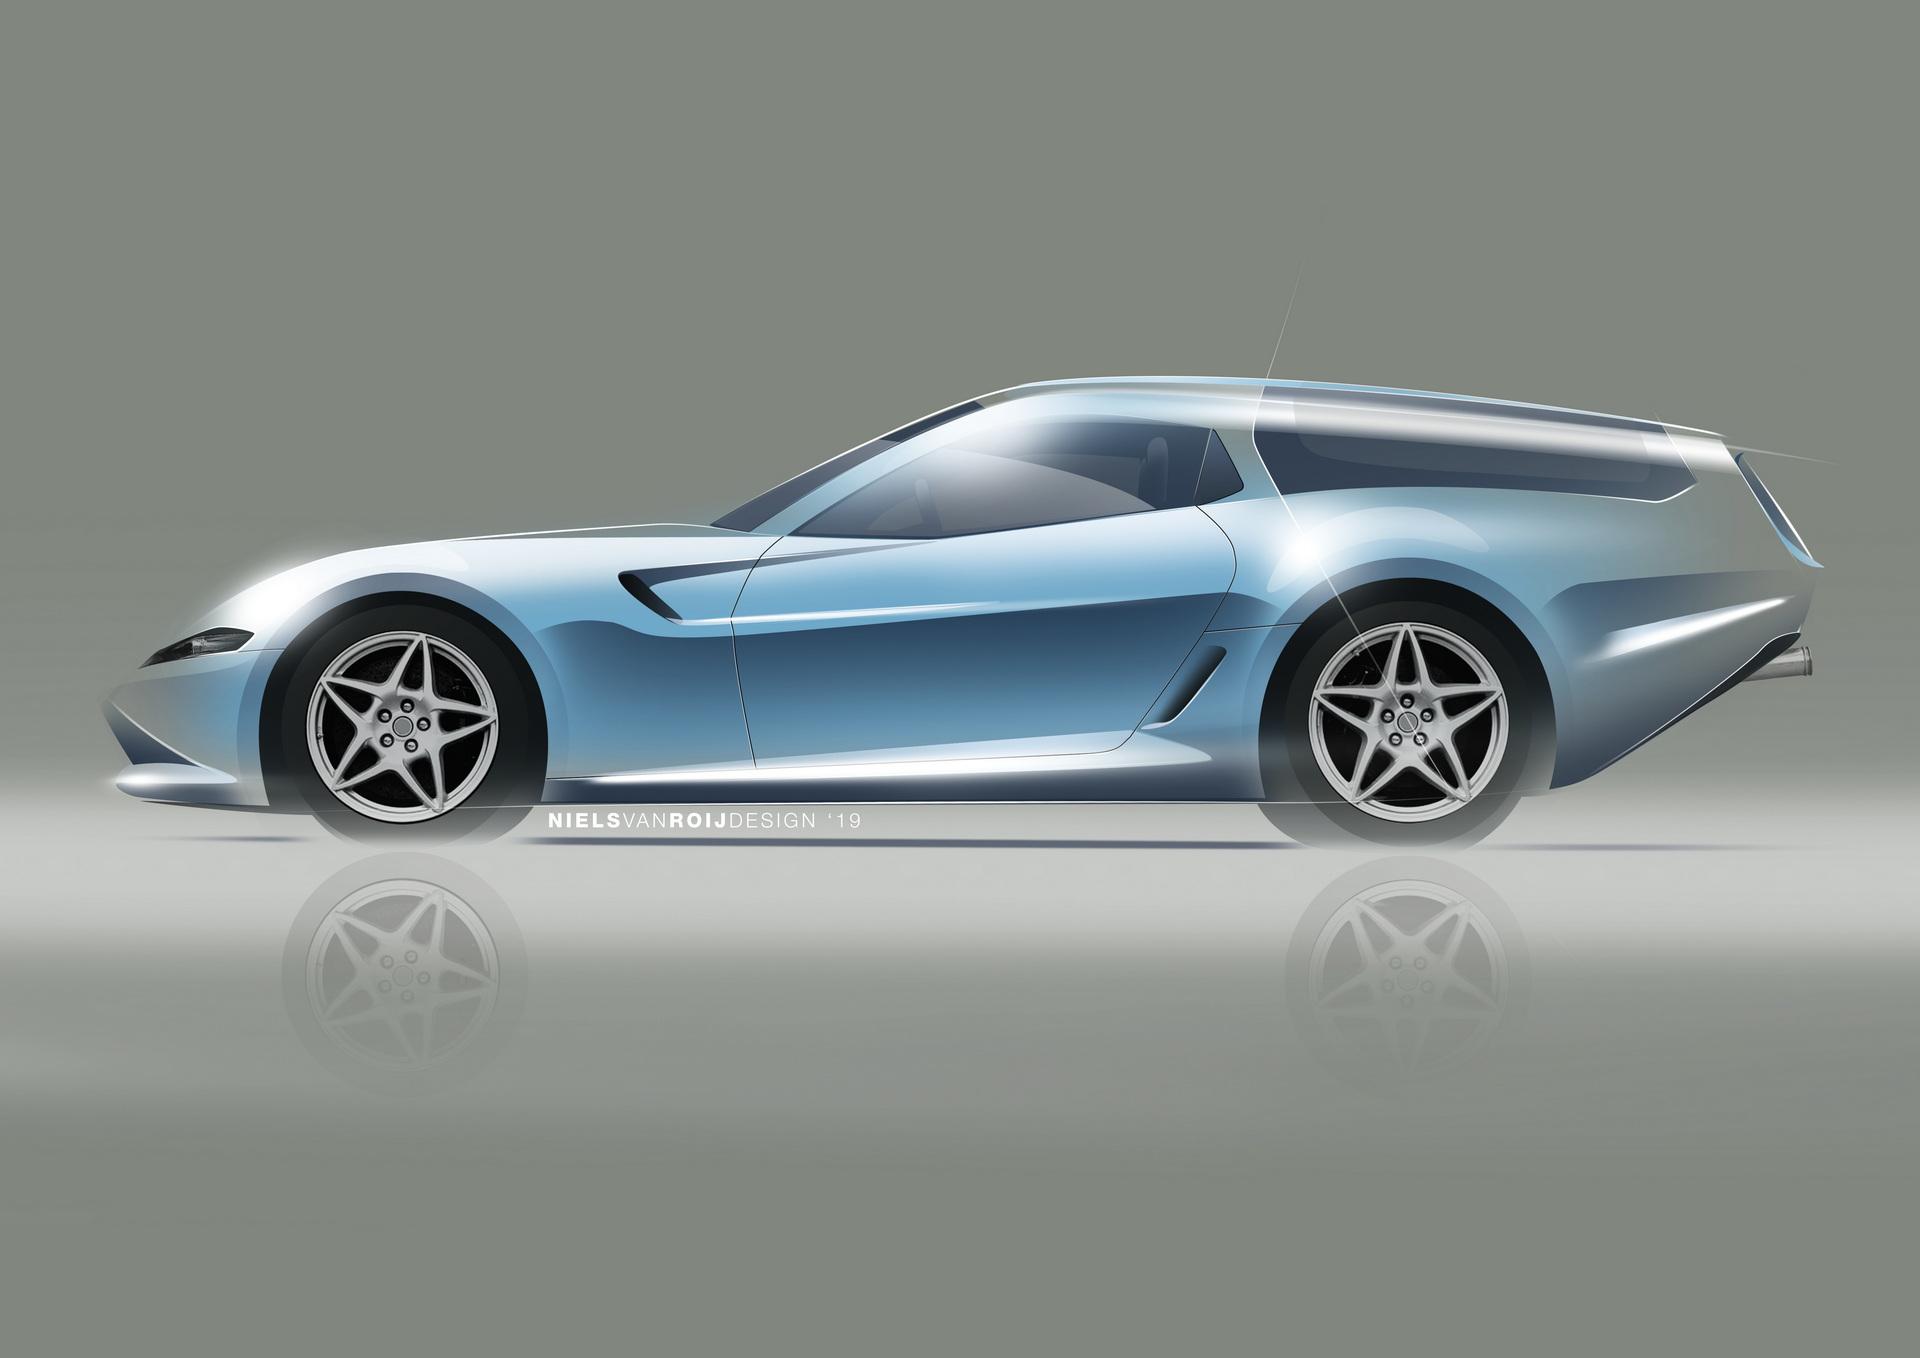 Ferrari-Daytona-Shooting-Brake-Hommage-by-Niels-van-Roij-Design-20